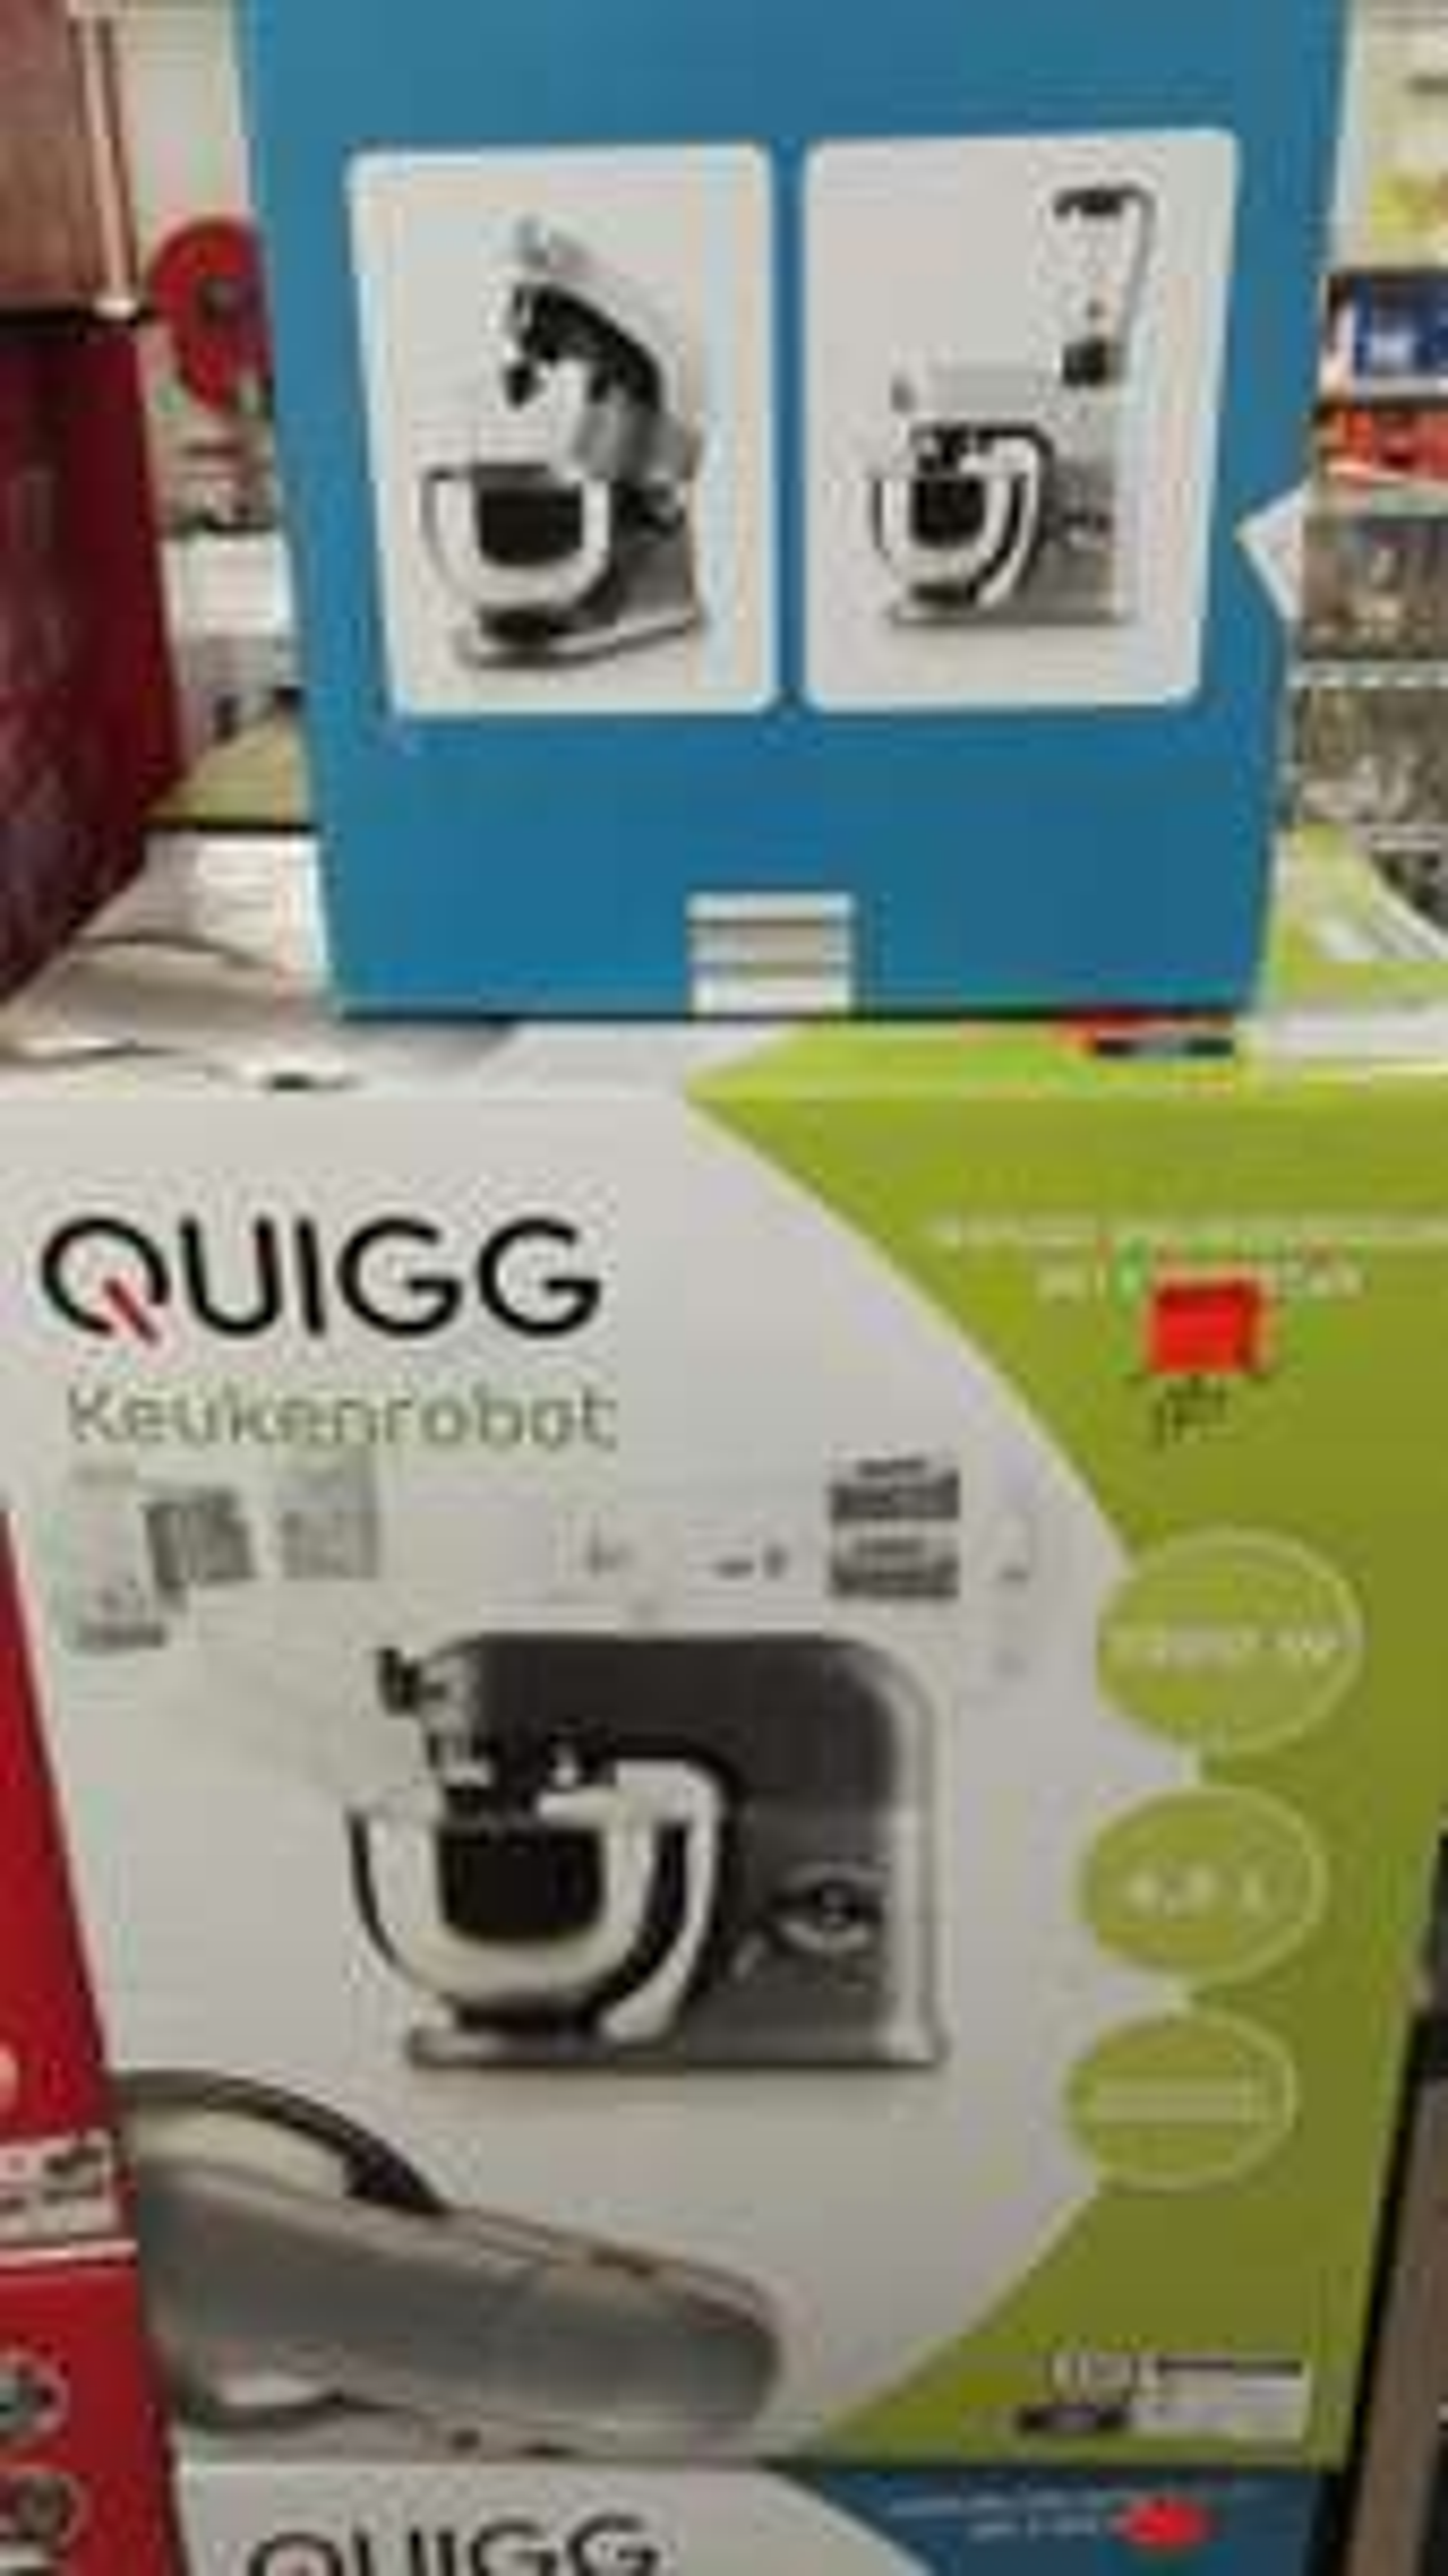 Robot pâtissier Quigg KR8 - 1000W, 4.5L